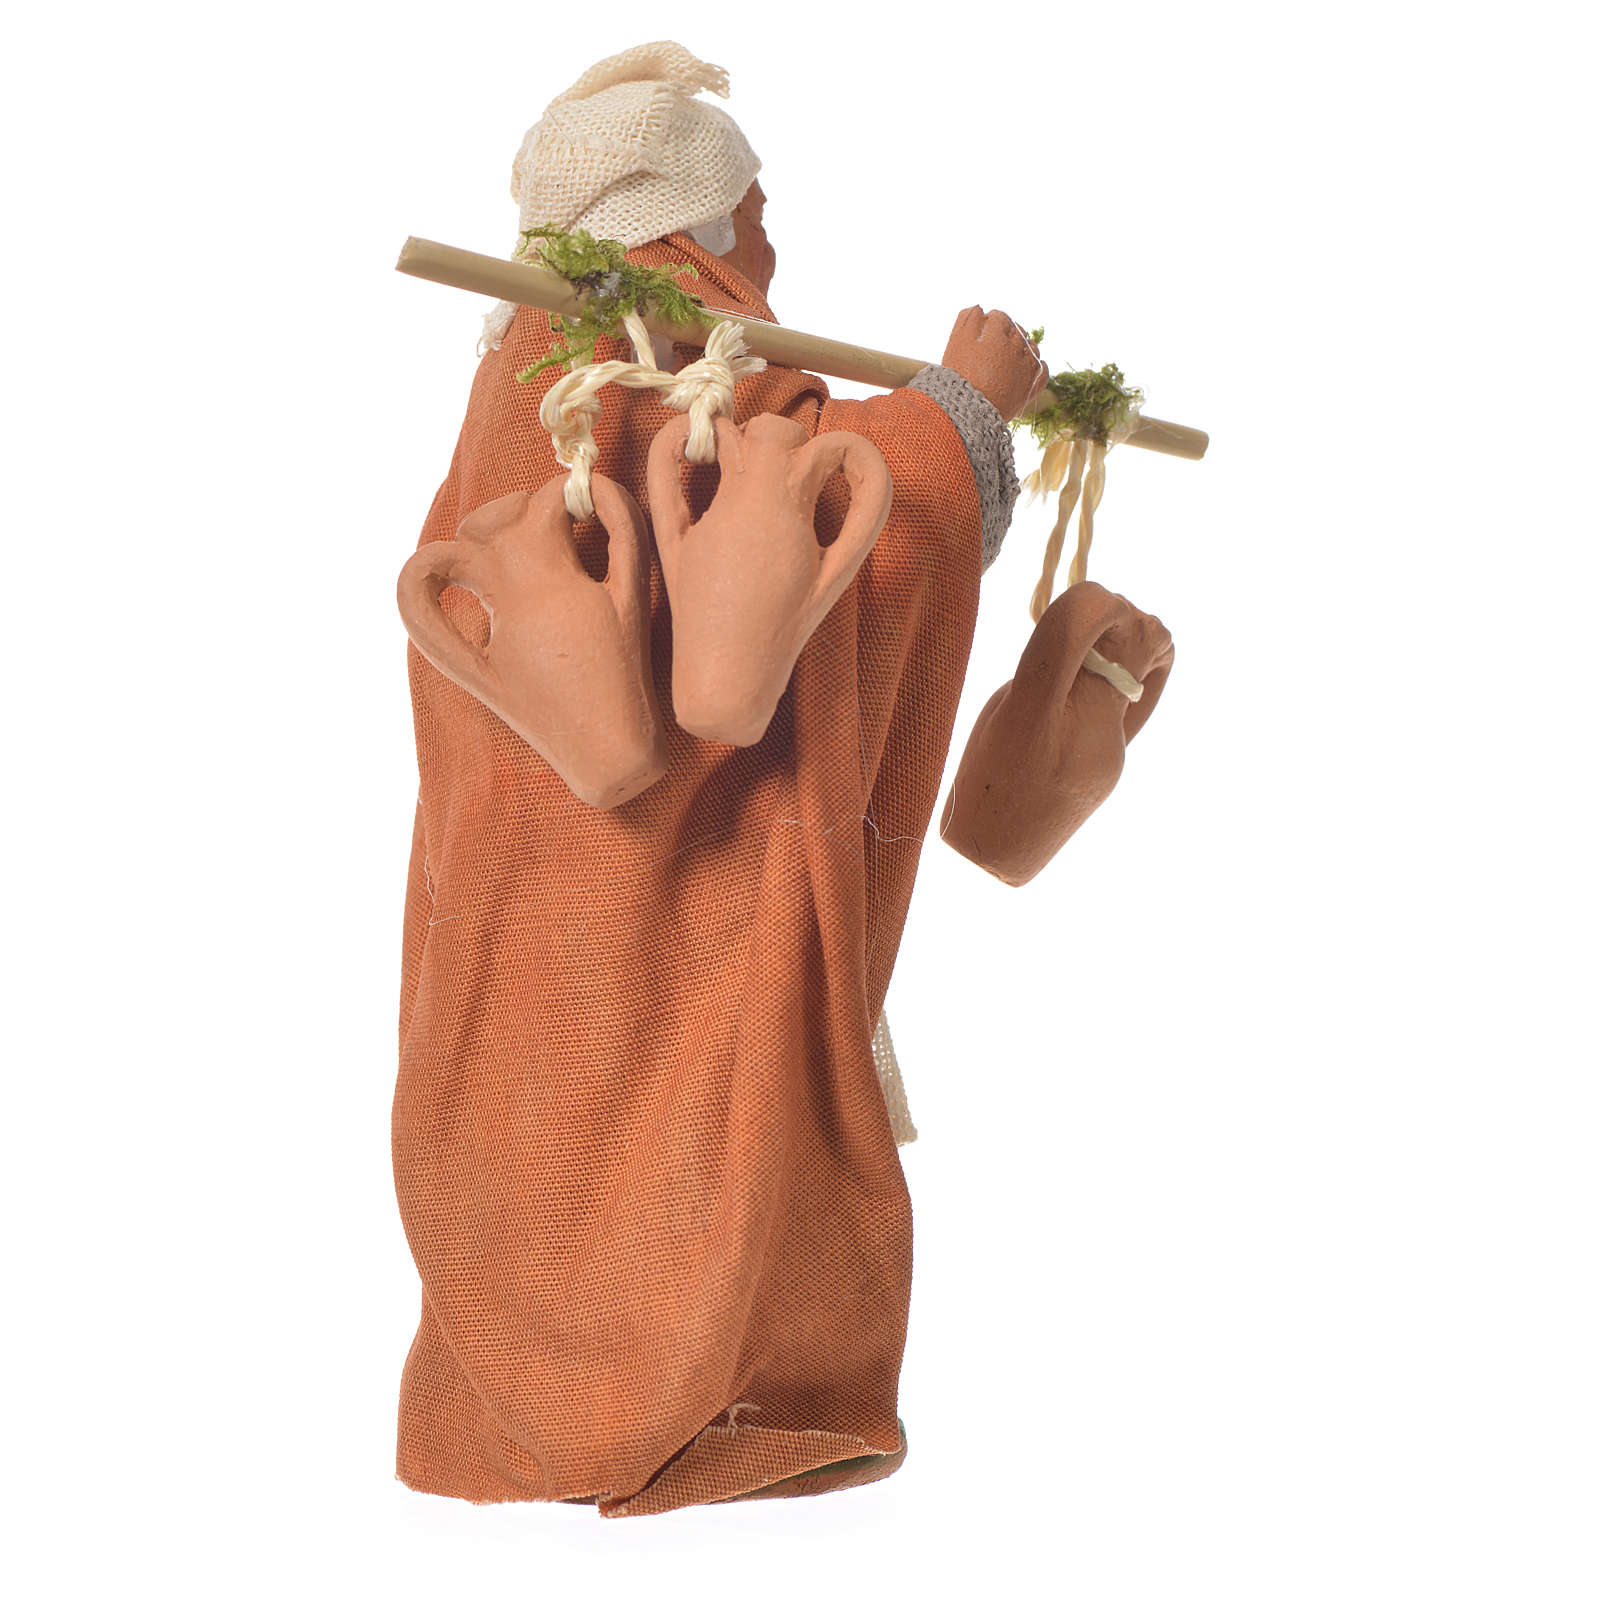 Viandante anfore appese 10 cm presepe napoletano 4